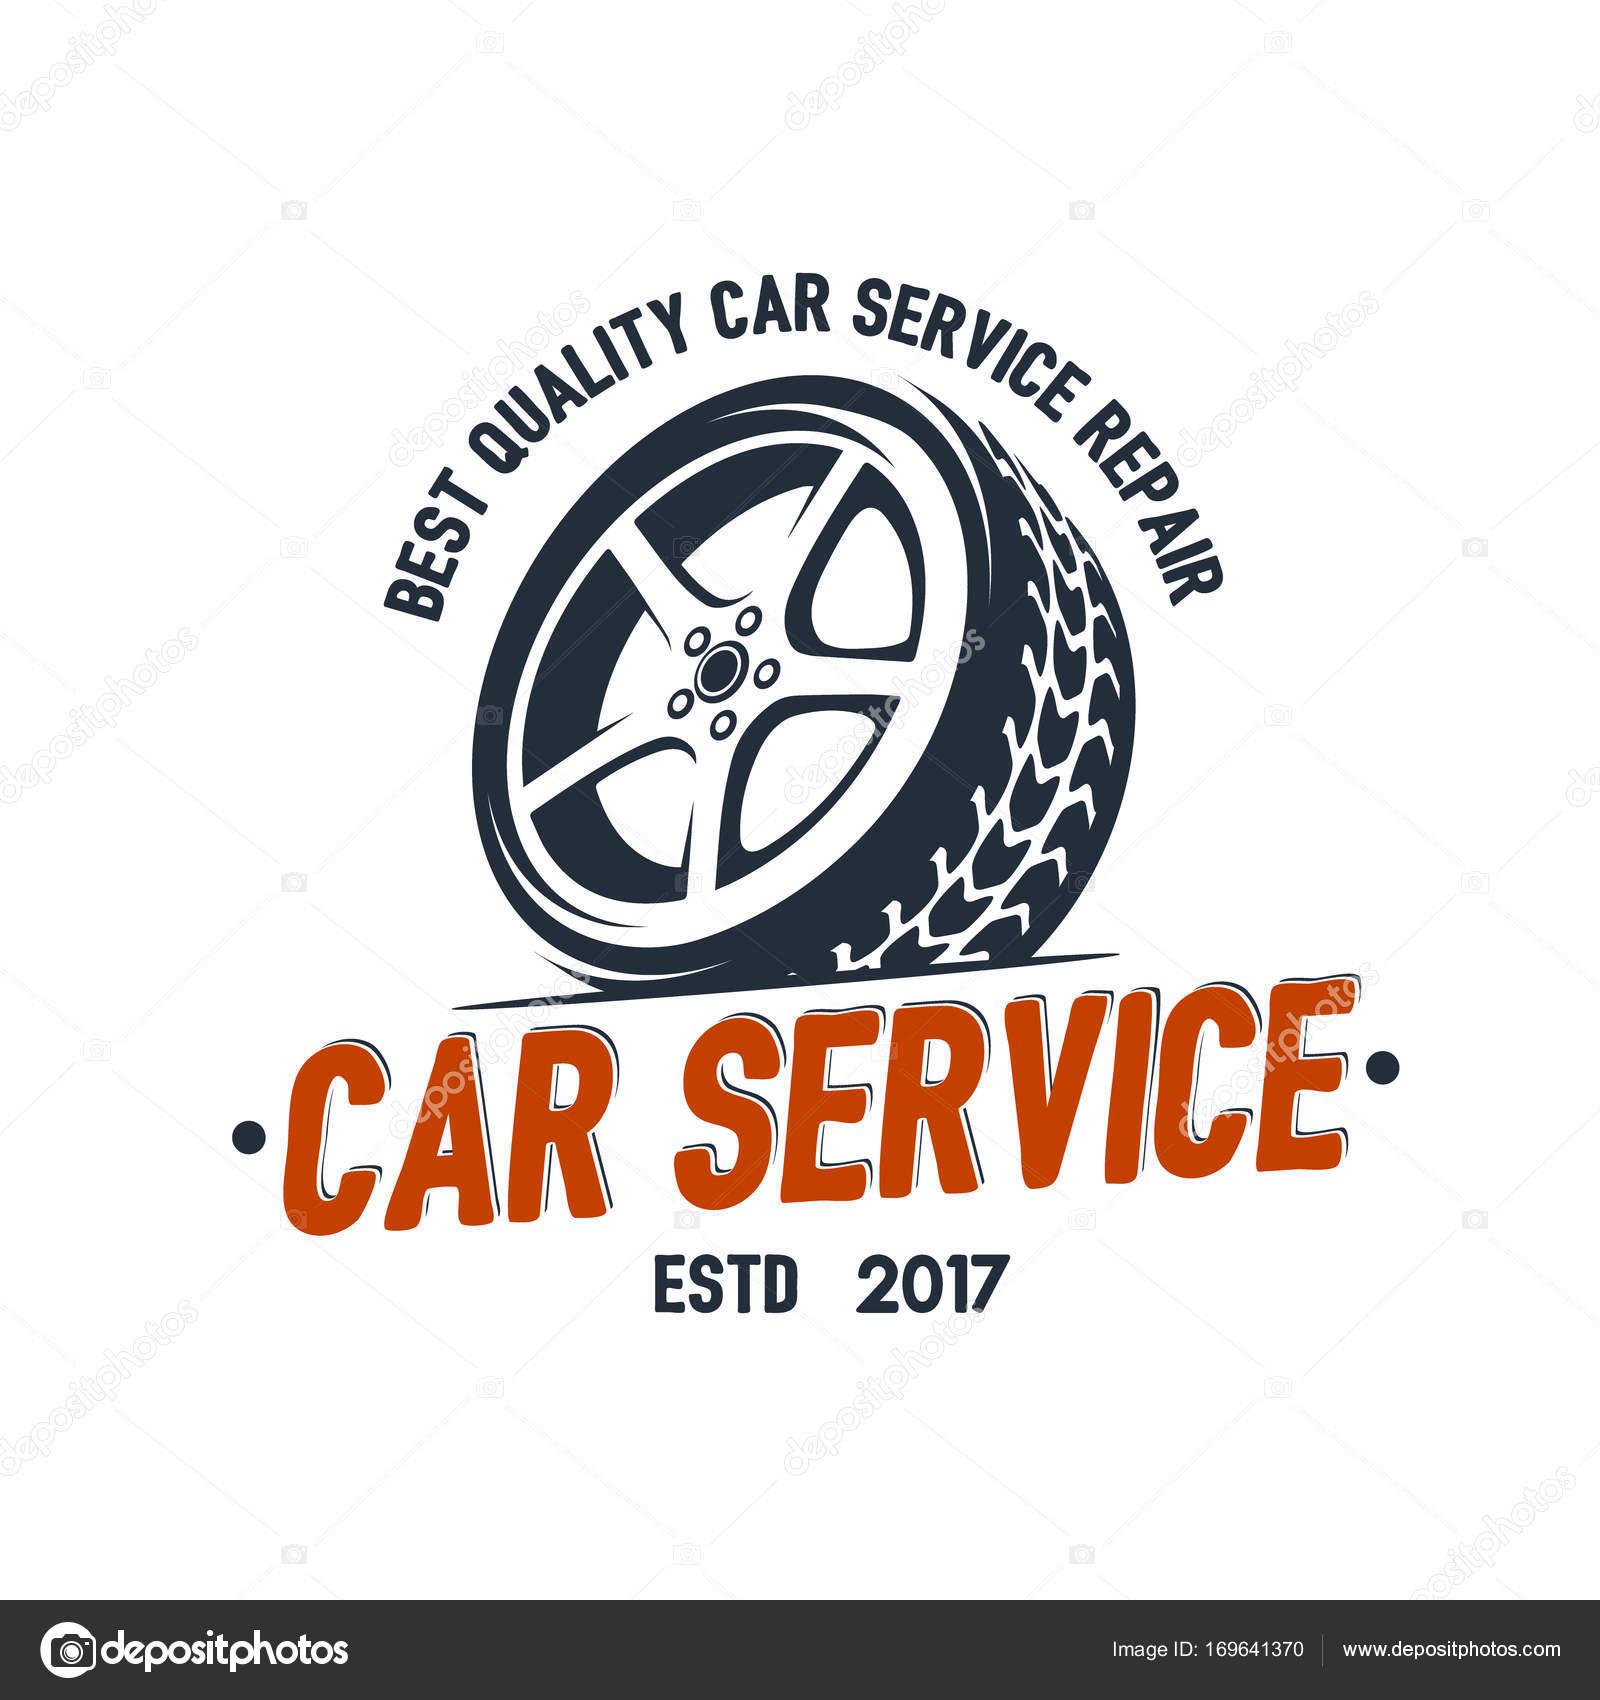 Car Service Wheel Logo Emblem Design Vector Vector Image By C Nazim Absemetov Vector Stock 169641370